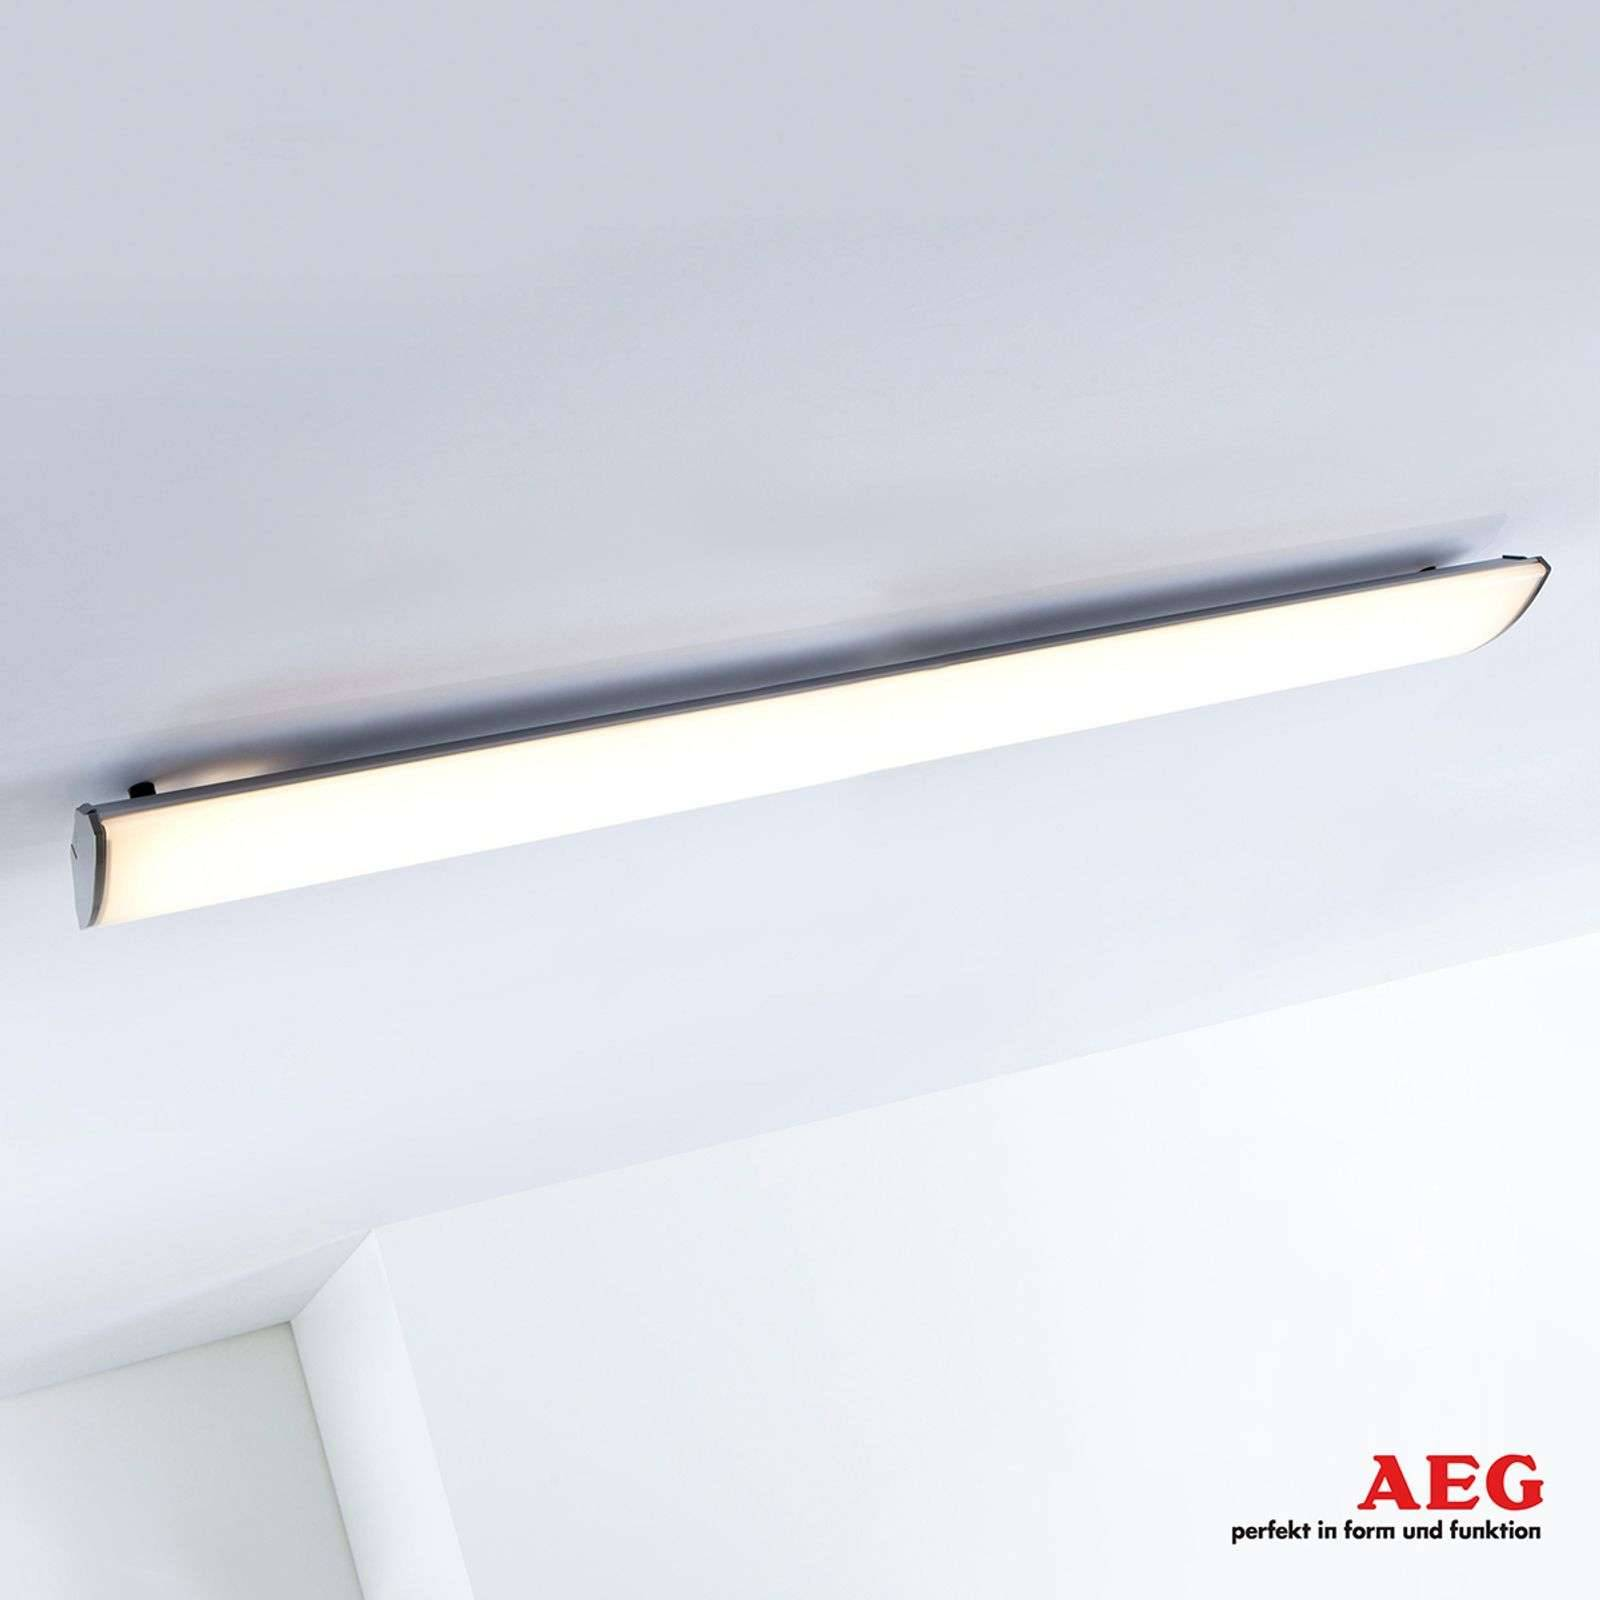 AEG LED Office – Plafoniera 44 W per ufficio